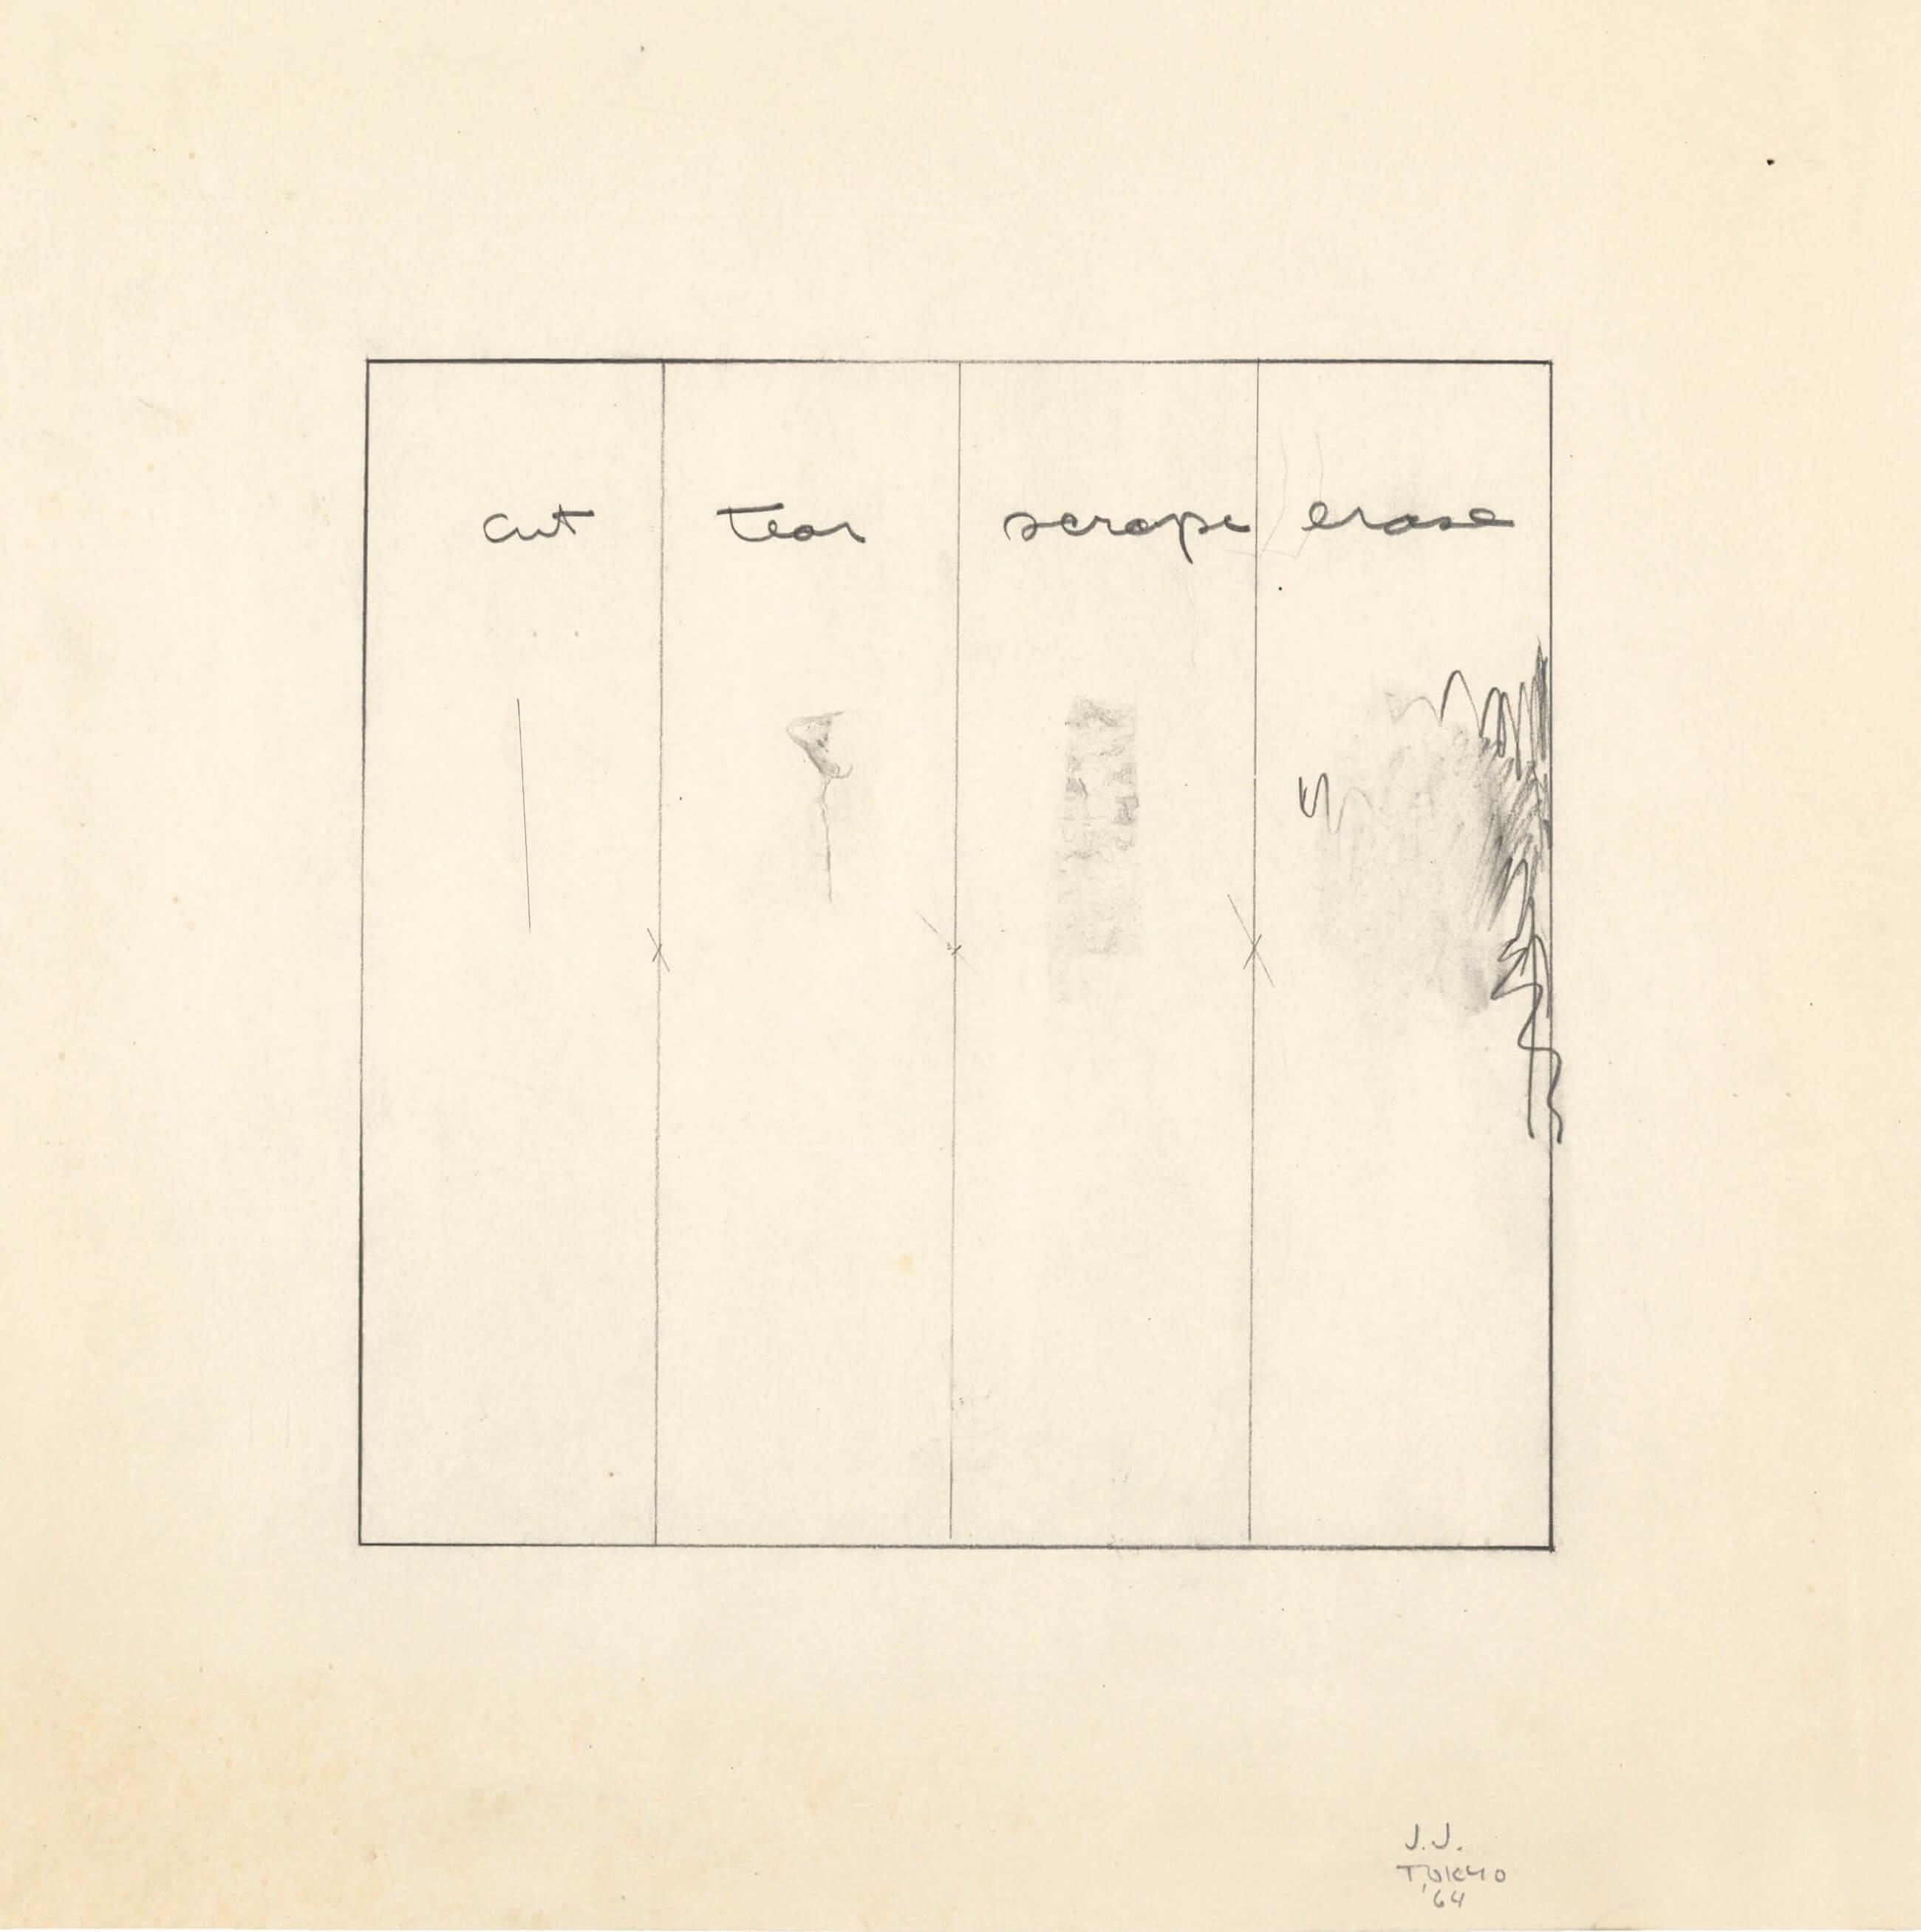 Untitled (Cut, Tear, Scrape, Erase), 1964, by Jasper Johns